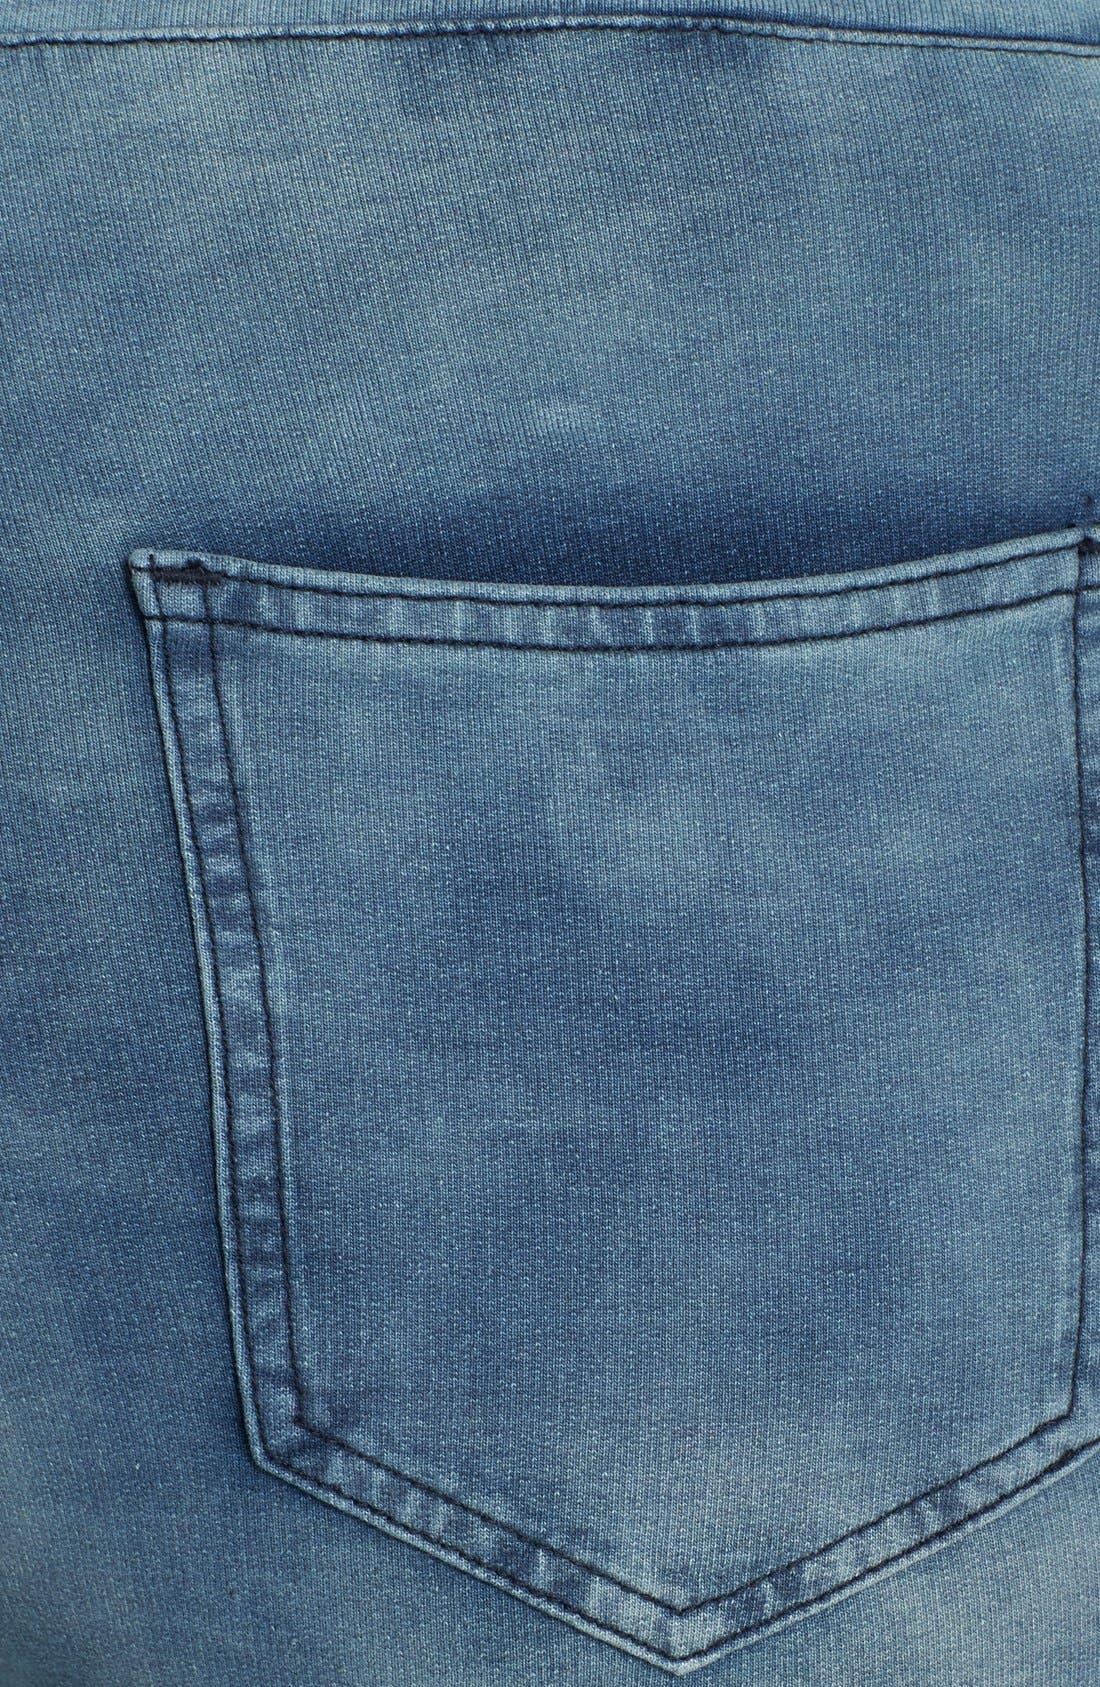 'Naomi' Stretch Knit Denim Jogger Pants,                             Alternate thumbnail 3, color,                             NOEL